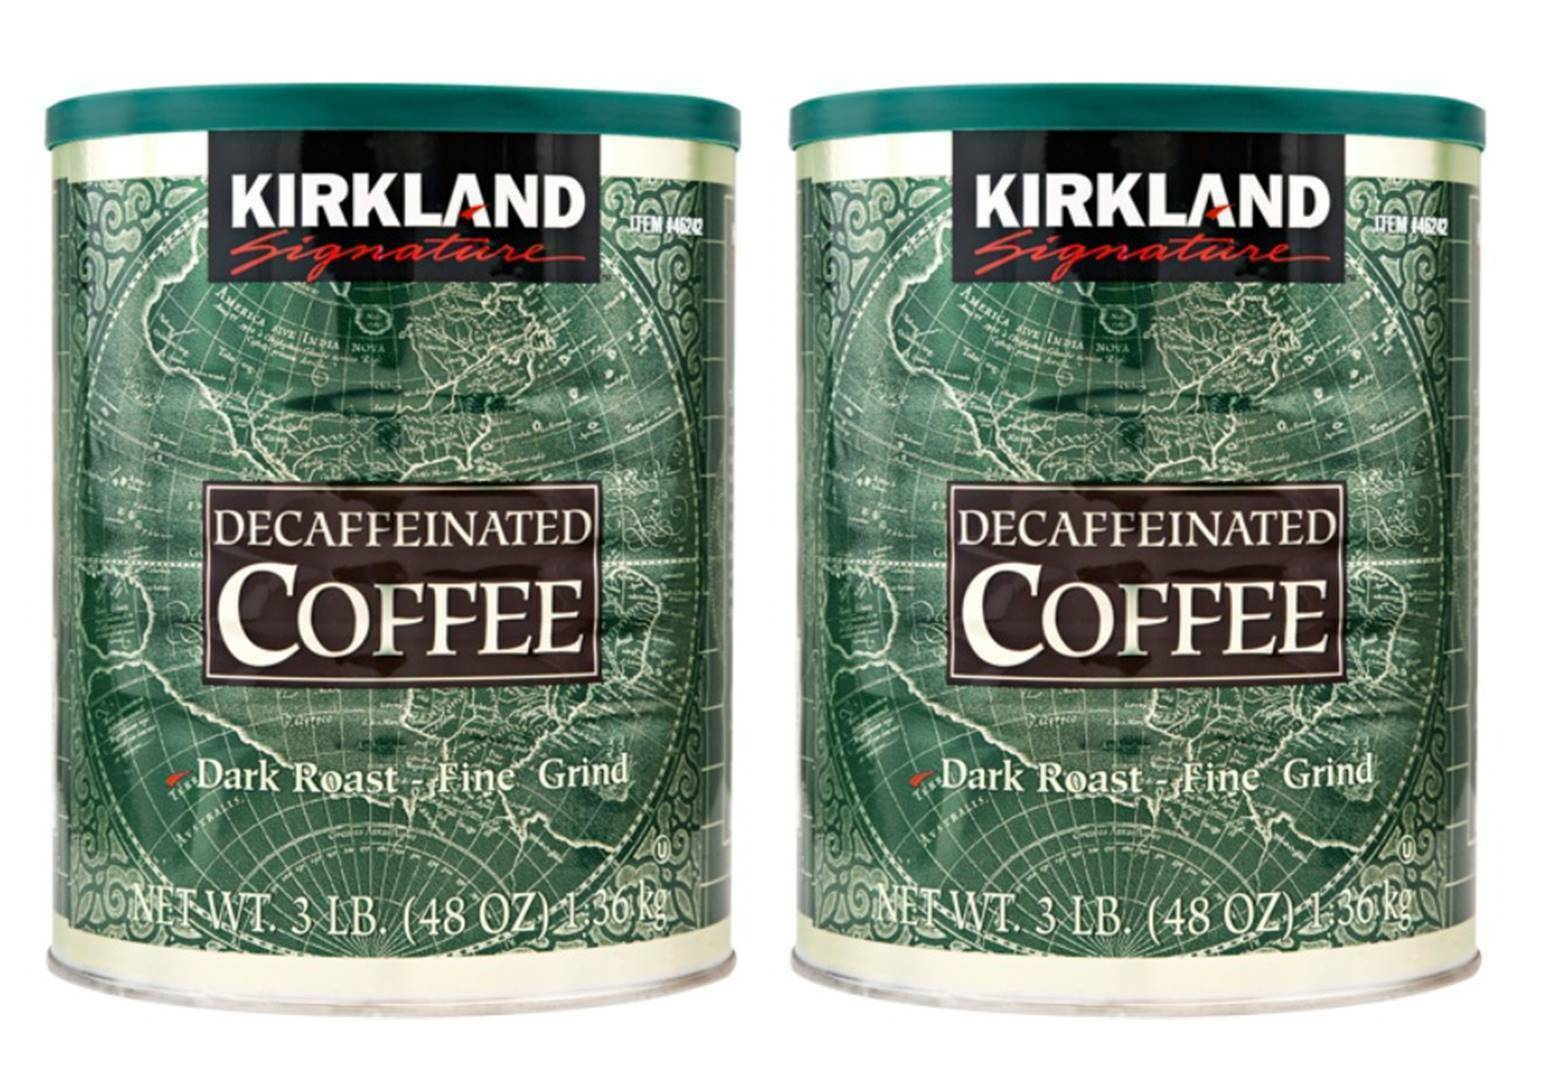 2 Packs Kirkland Signature Arabica Decaffeinated Coffee 3 LB total 6 LB Exp 2022 - $38.49